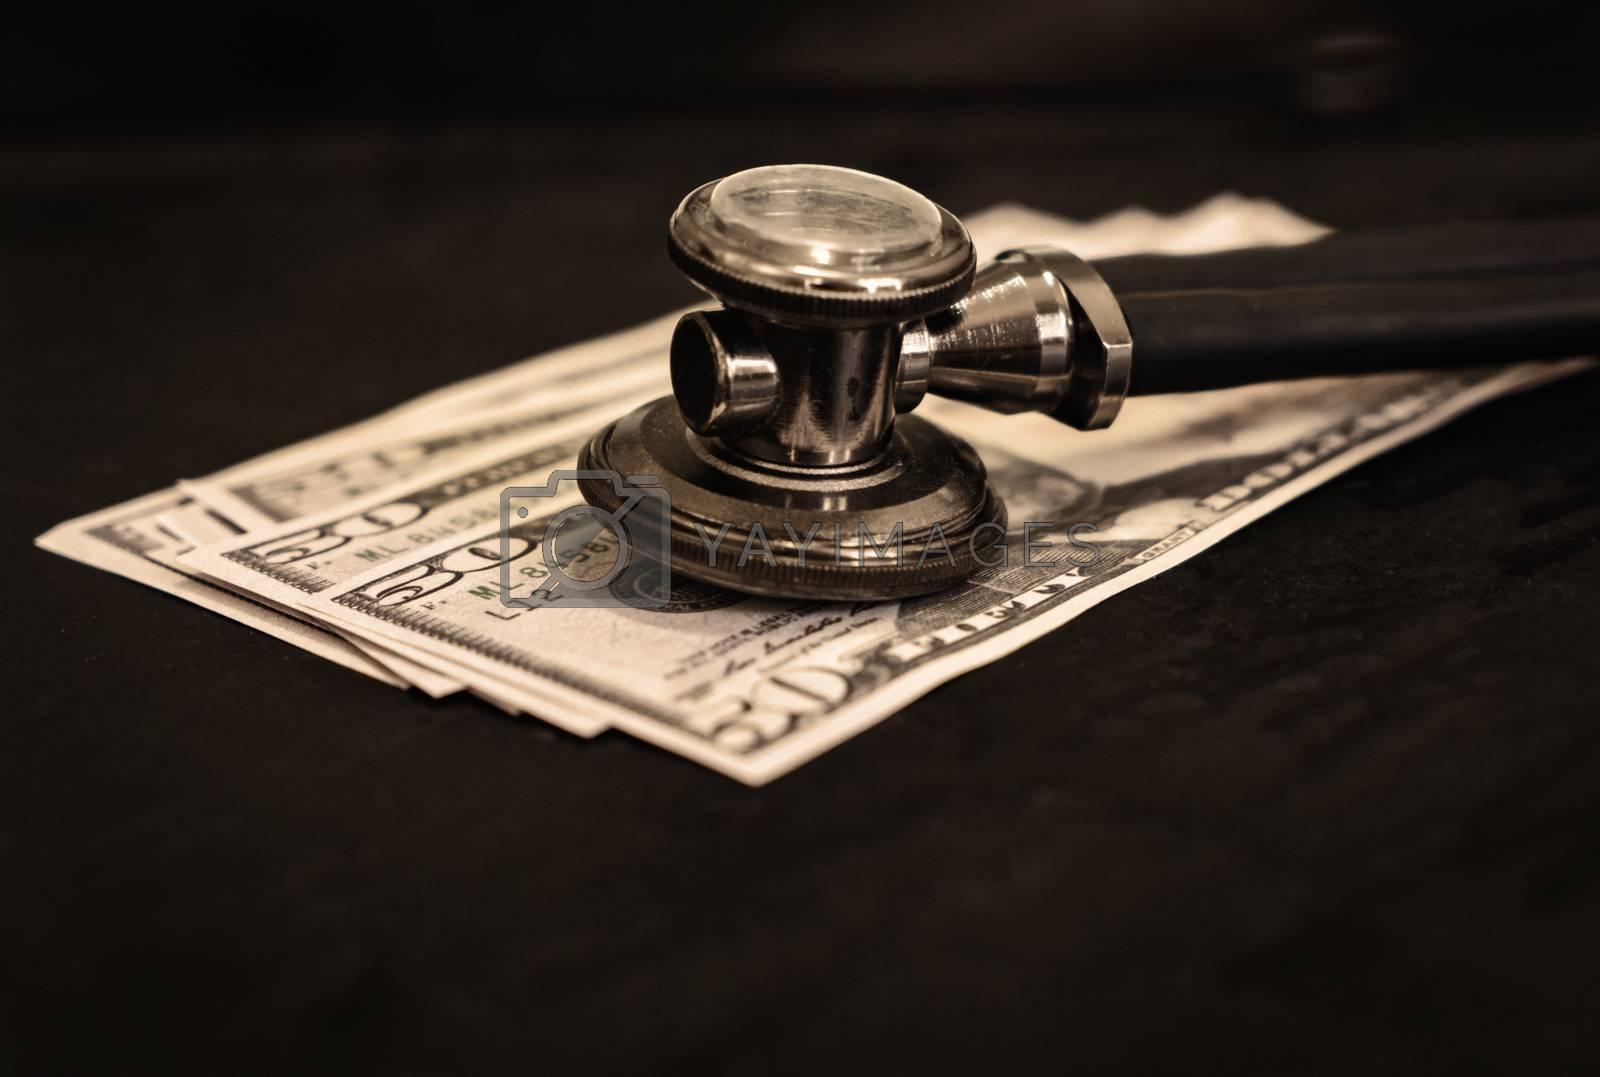 A stethoscope on three fifty dollar bills. Sepia toned photo